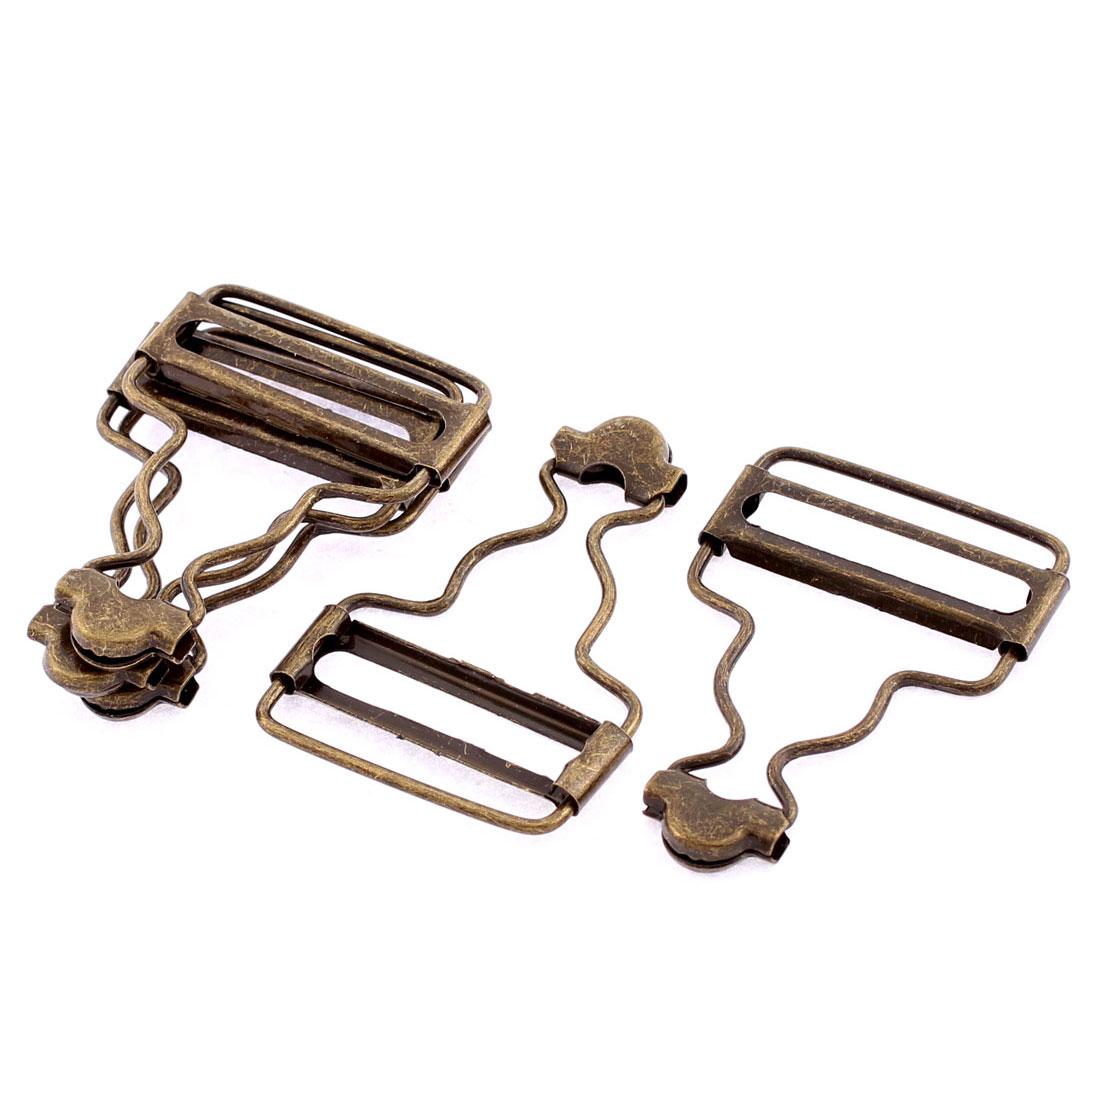 32mm Inside Width Dungaree Fasteners Clip Suspender Buckles 5Pcs